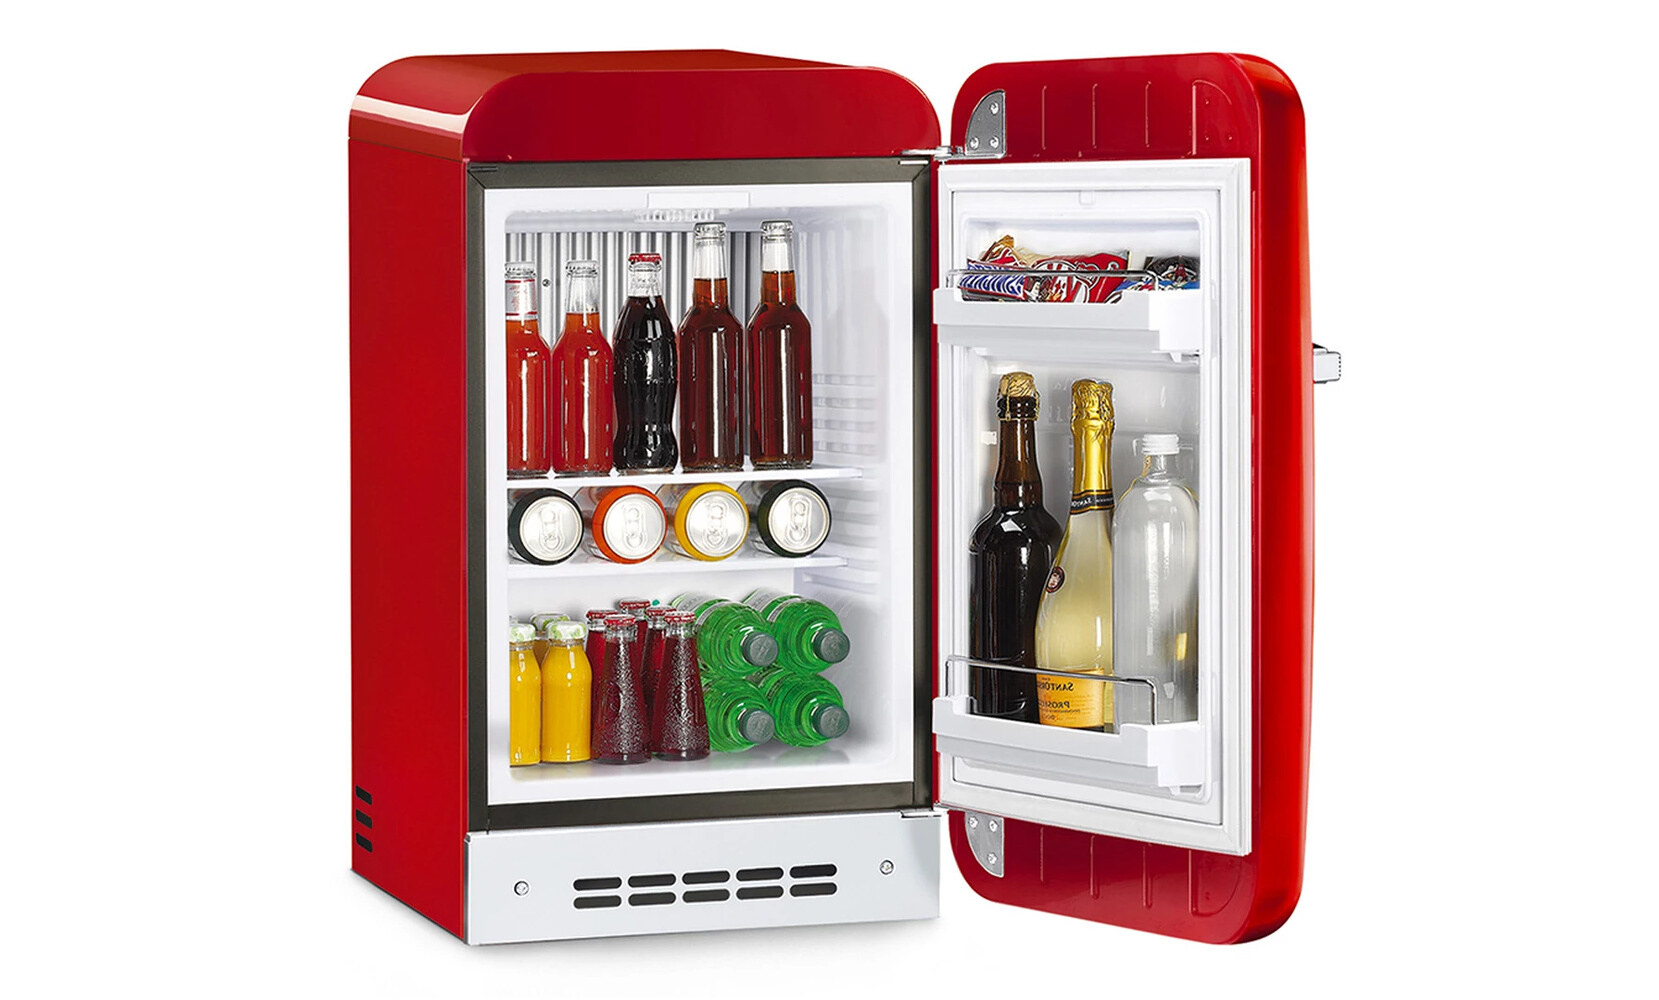 Smeg x Supreme mini-frigo